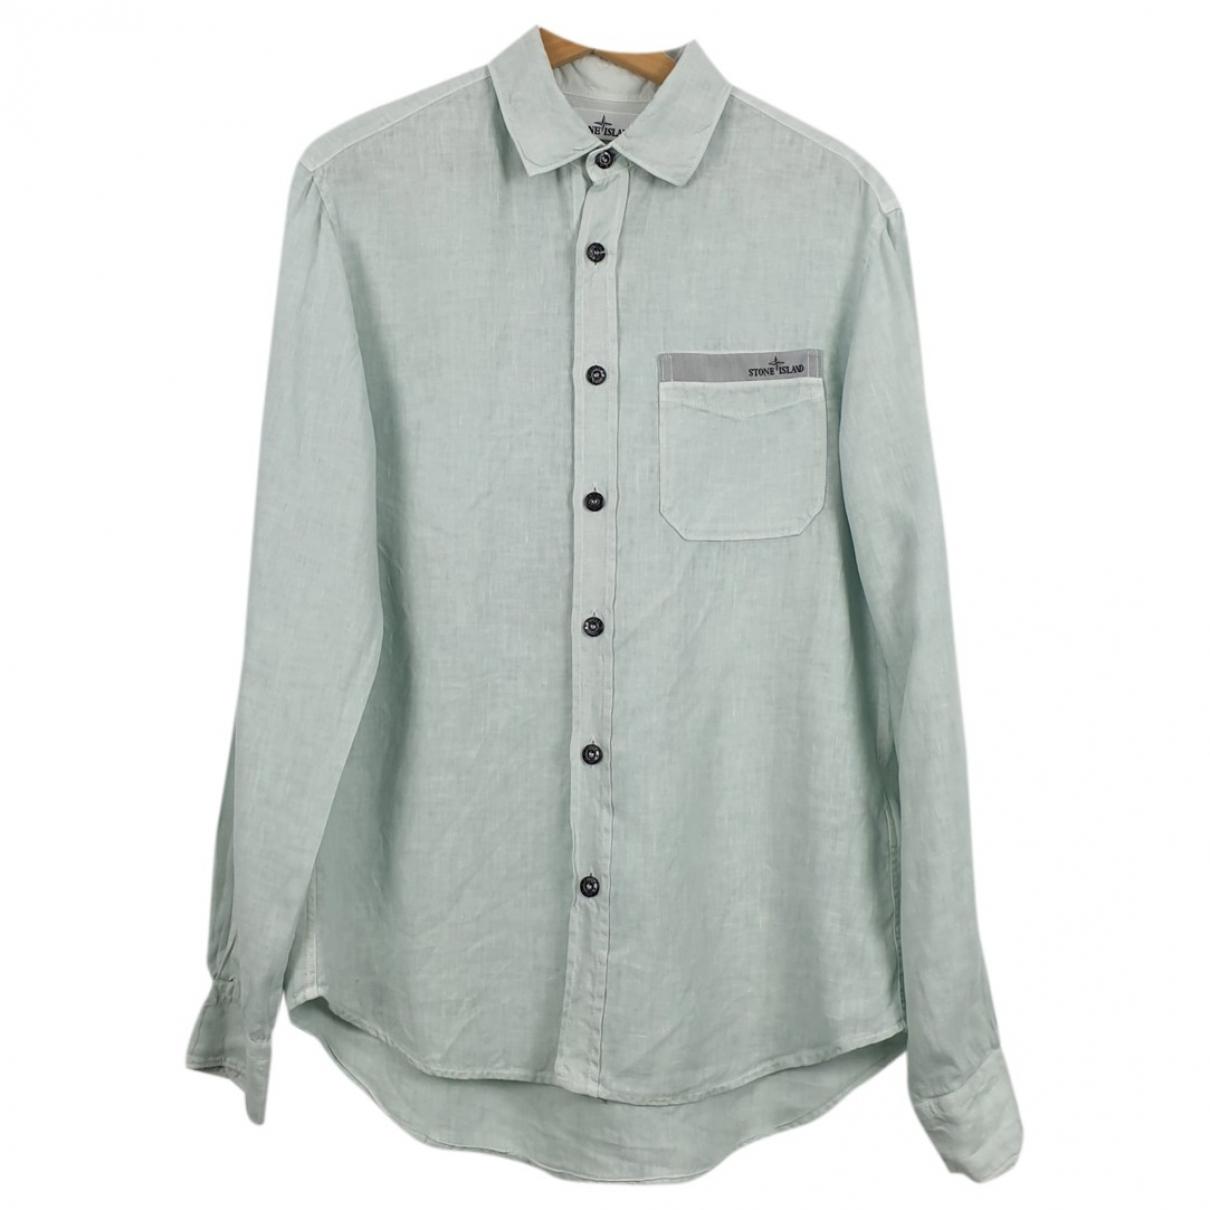 Stone Island \N Turquoise Linen Shirts for Men S International